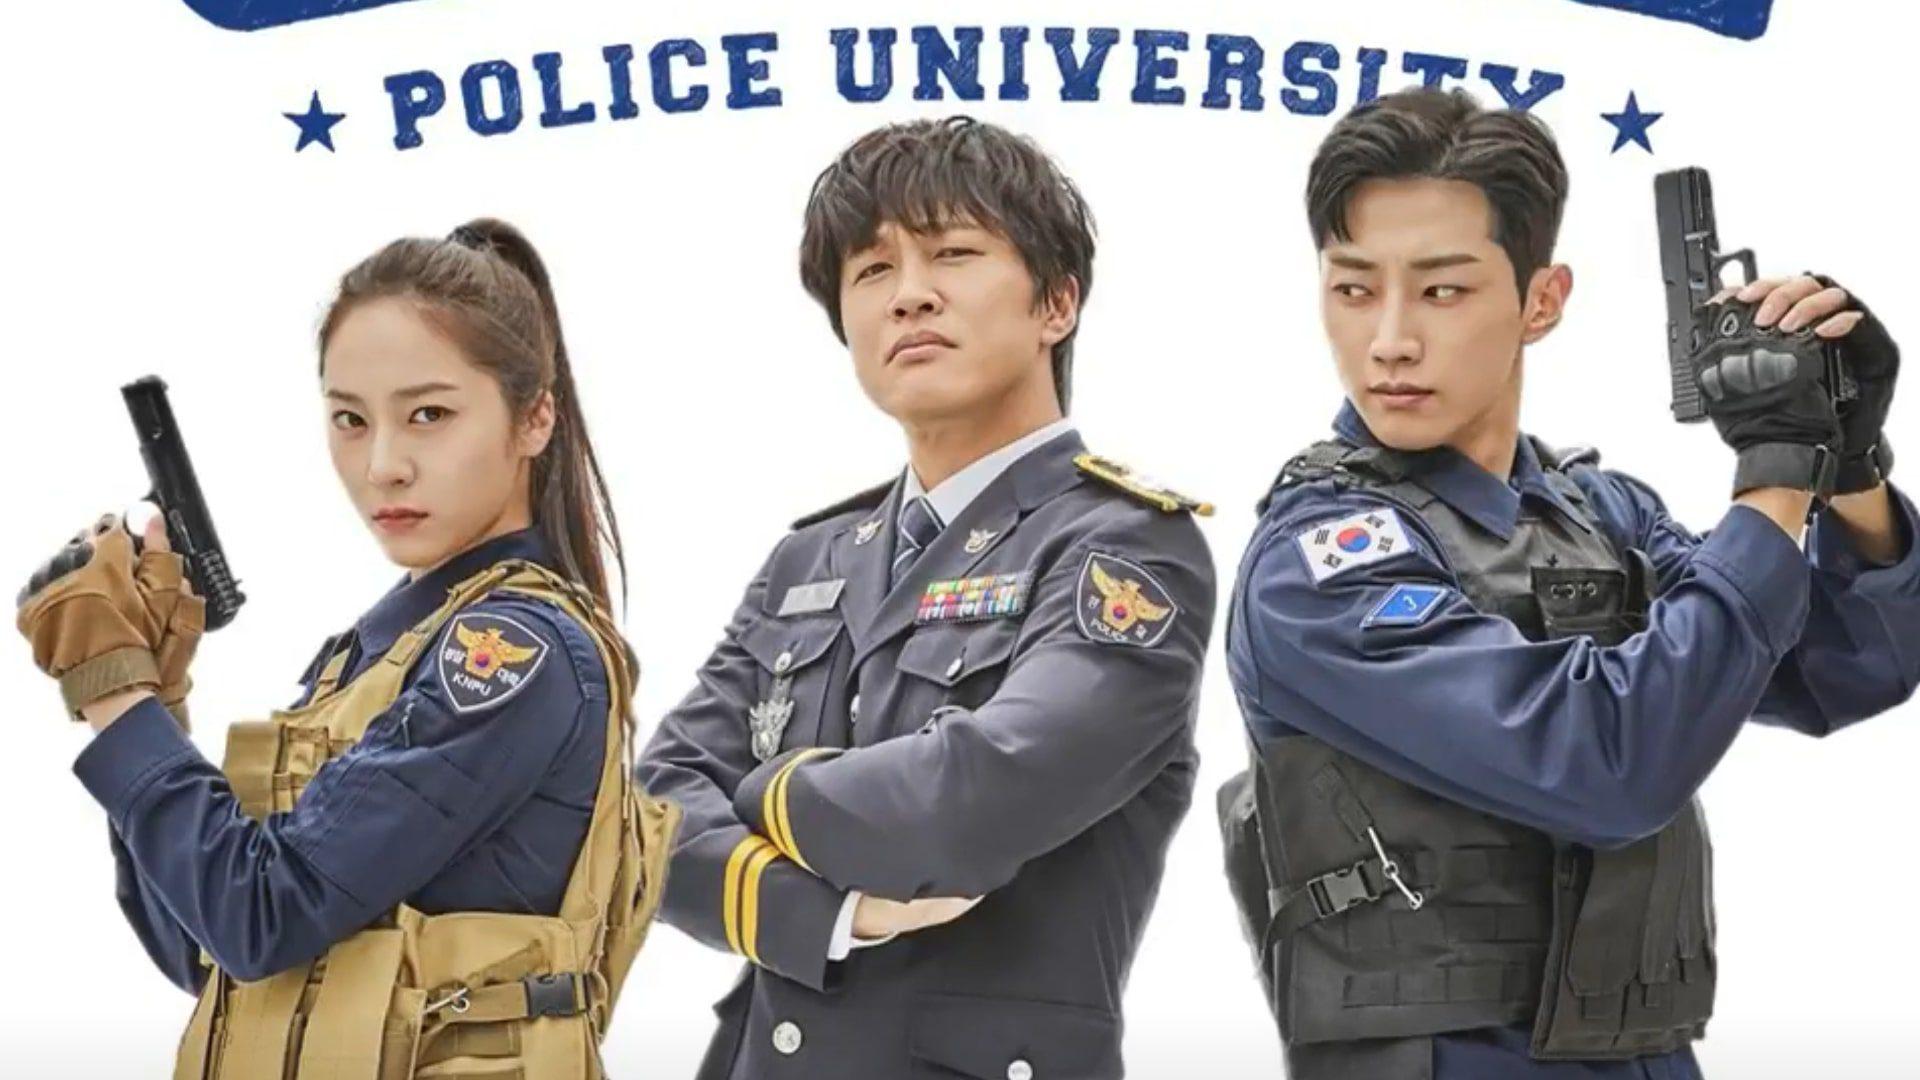 Police University Episode 13 release date